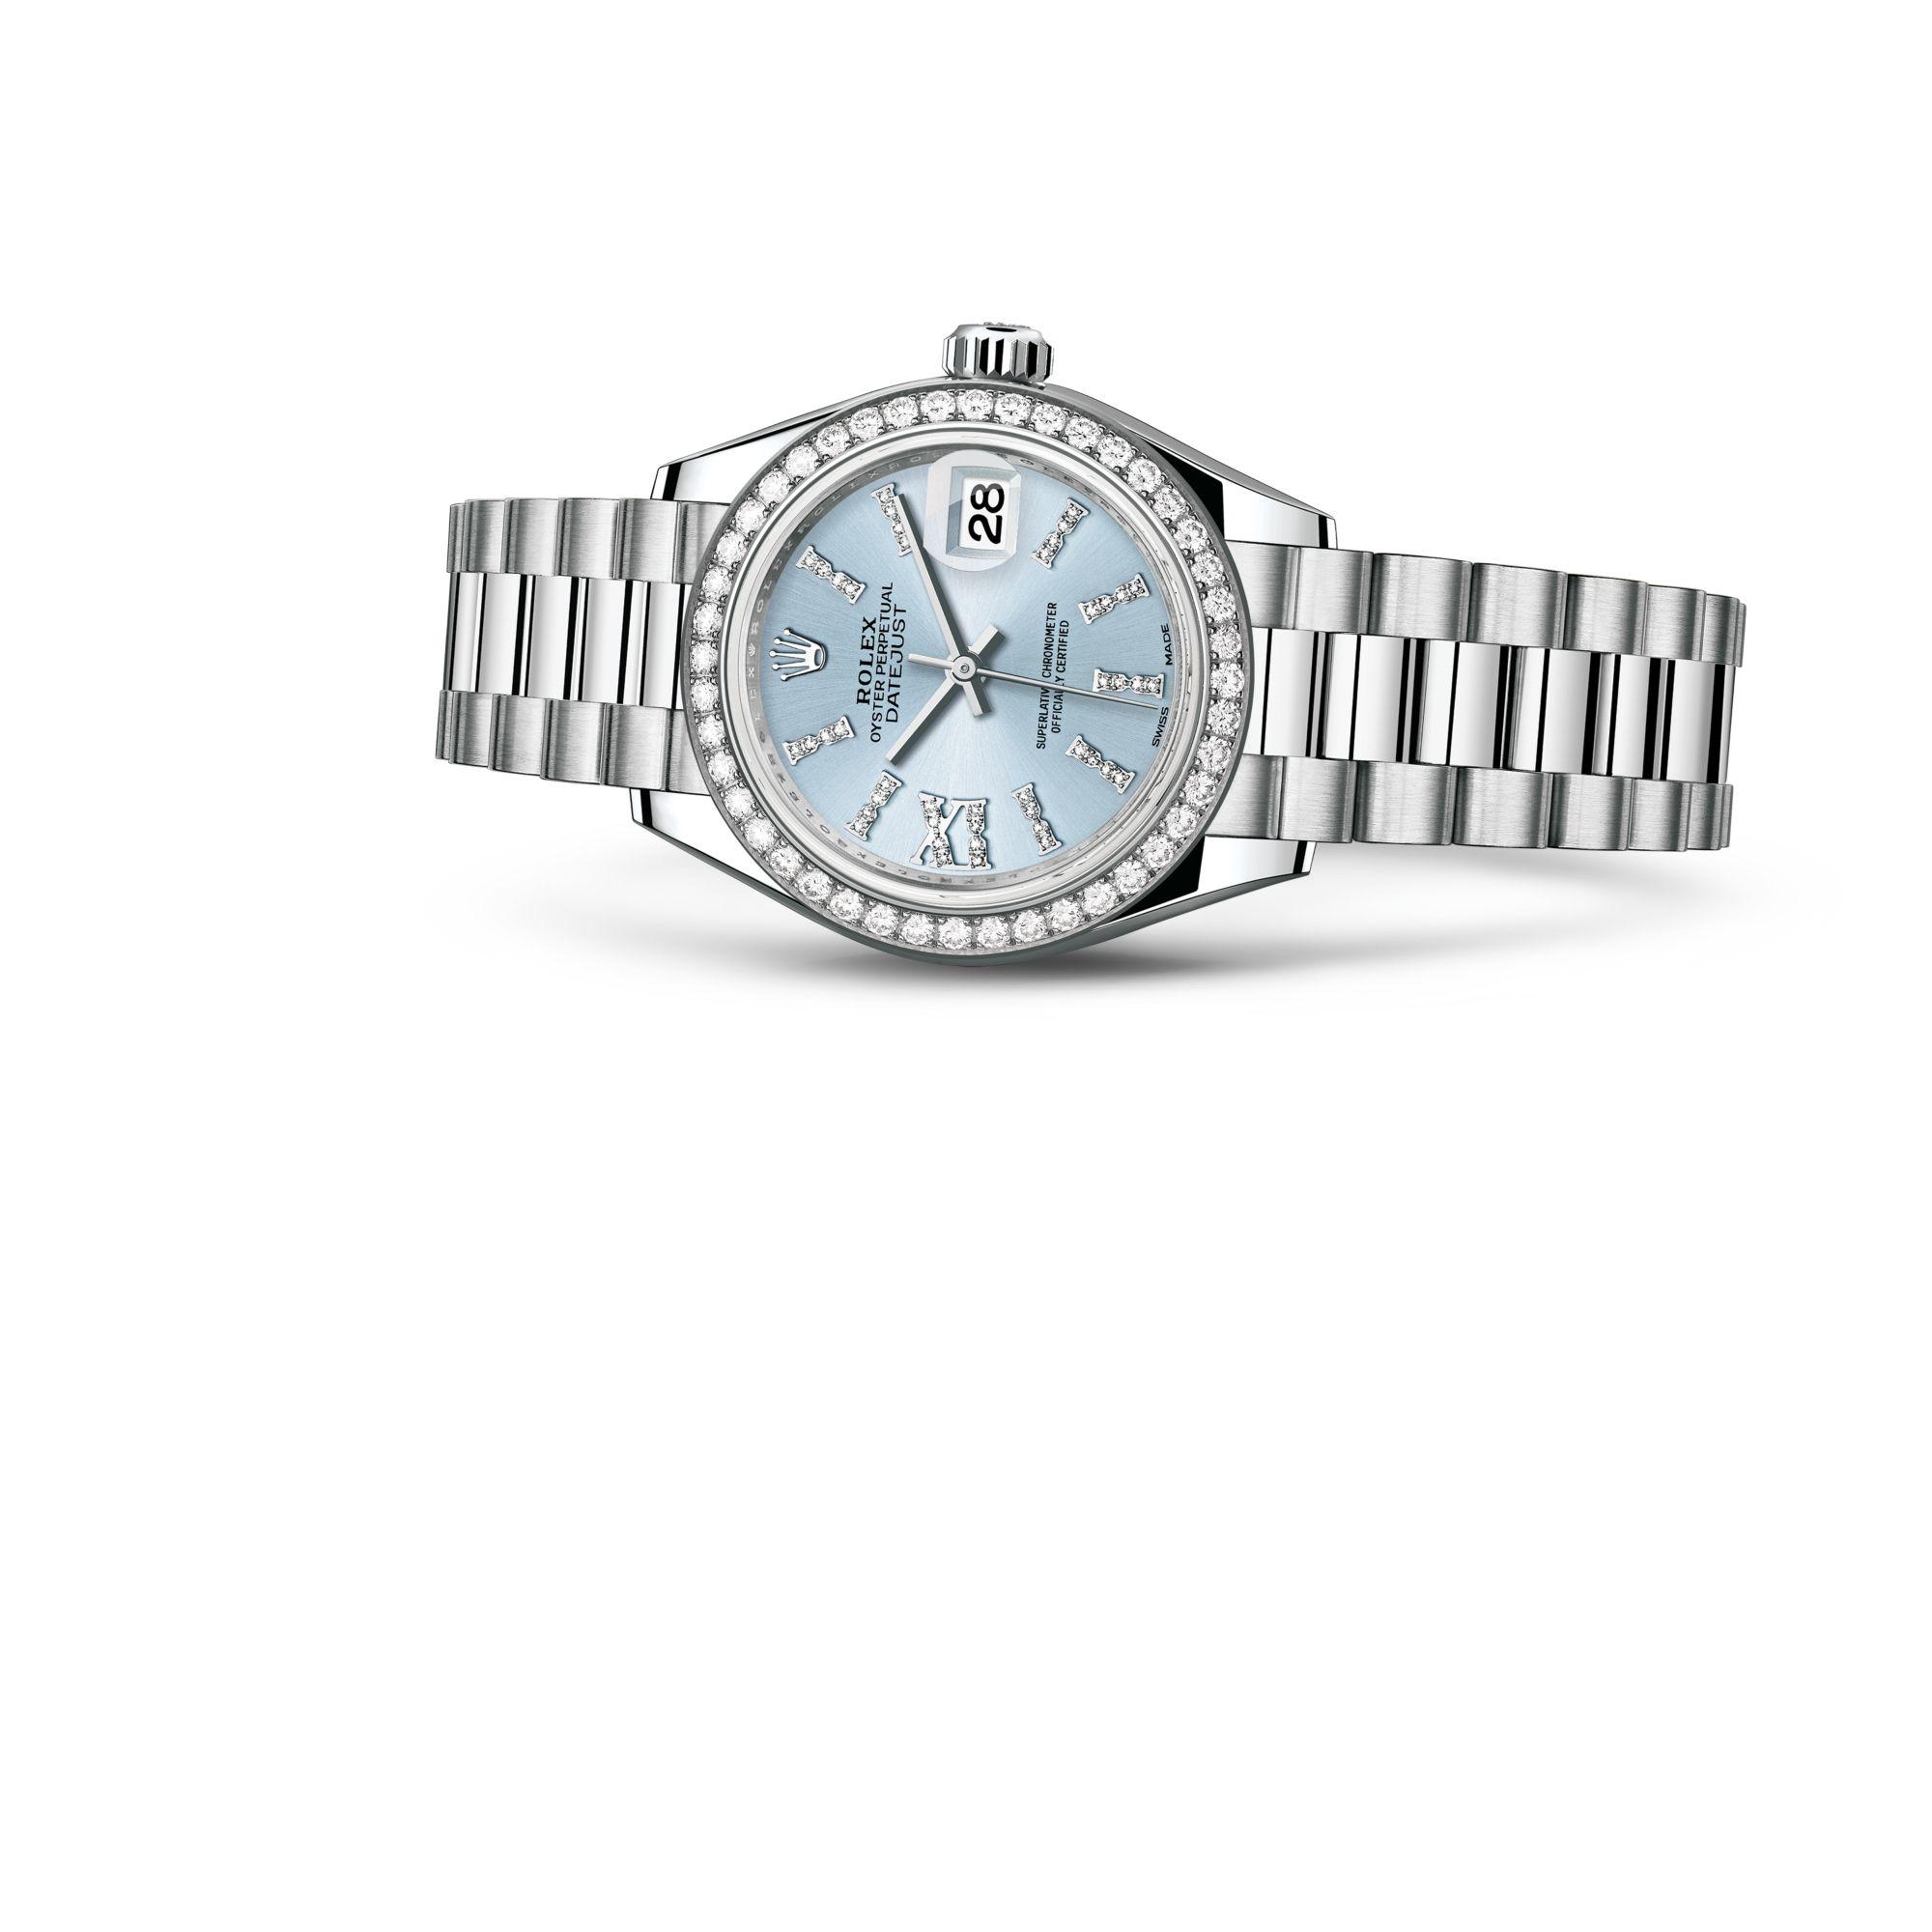 Rolex ليدي ديت جست ٢٨ M279136RBR-0001